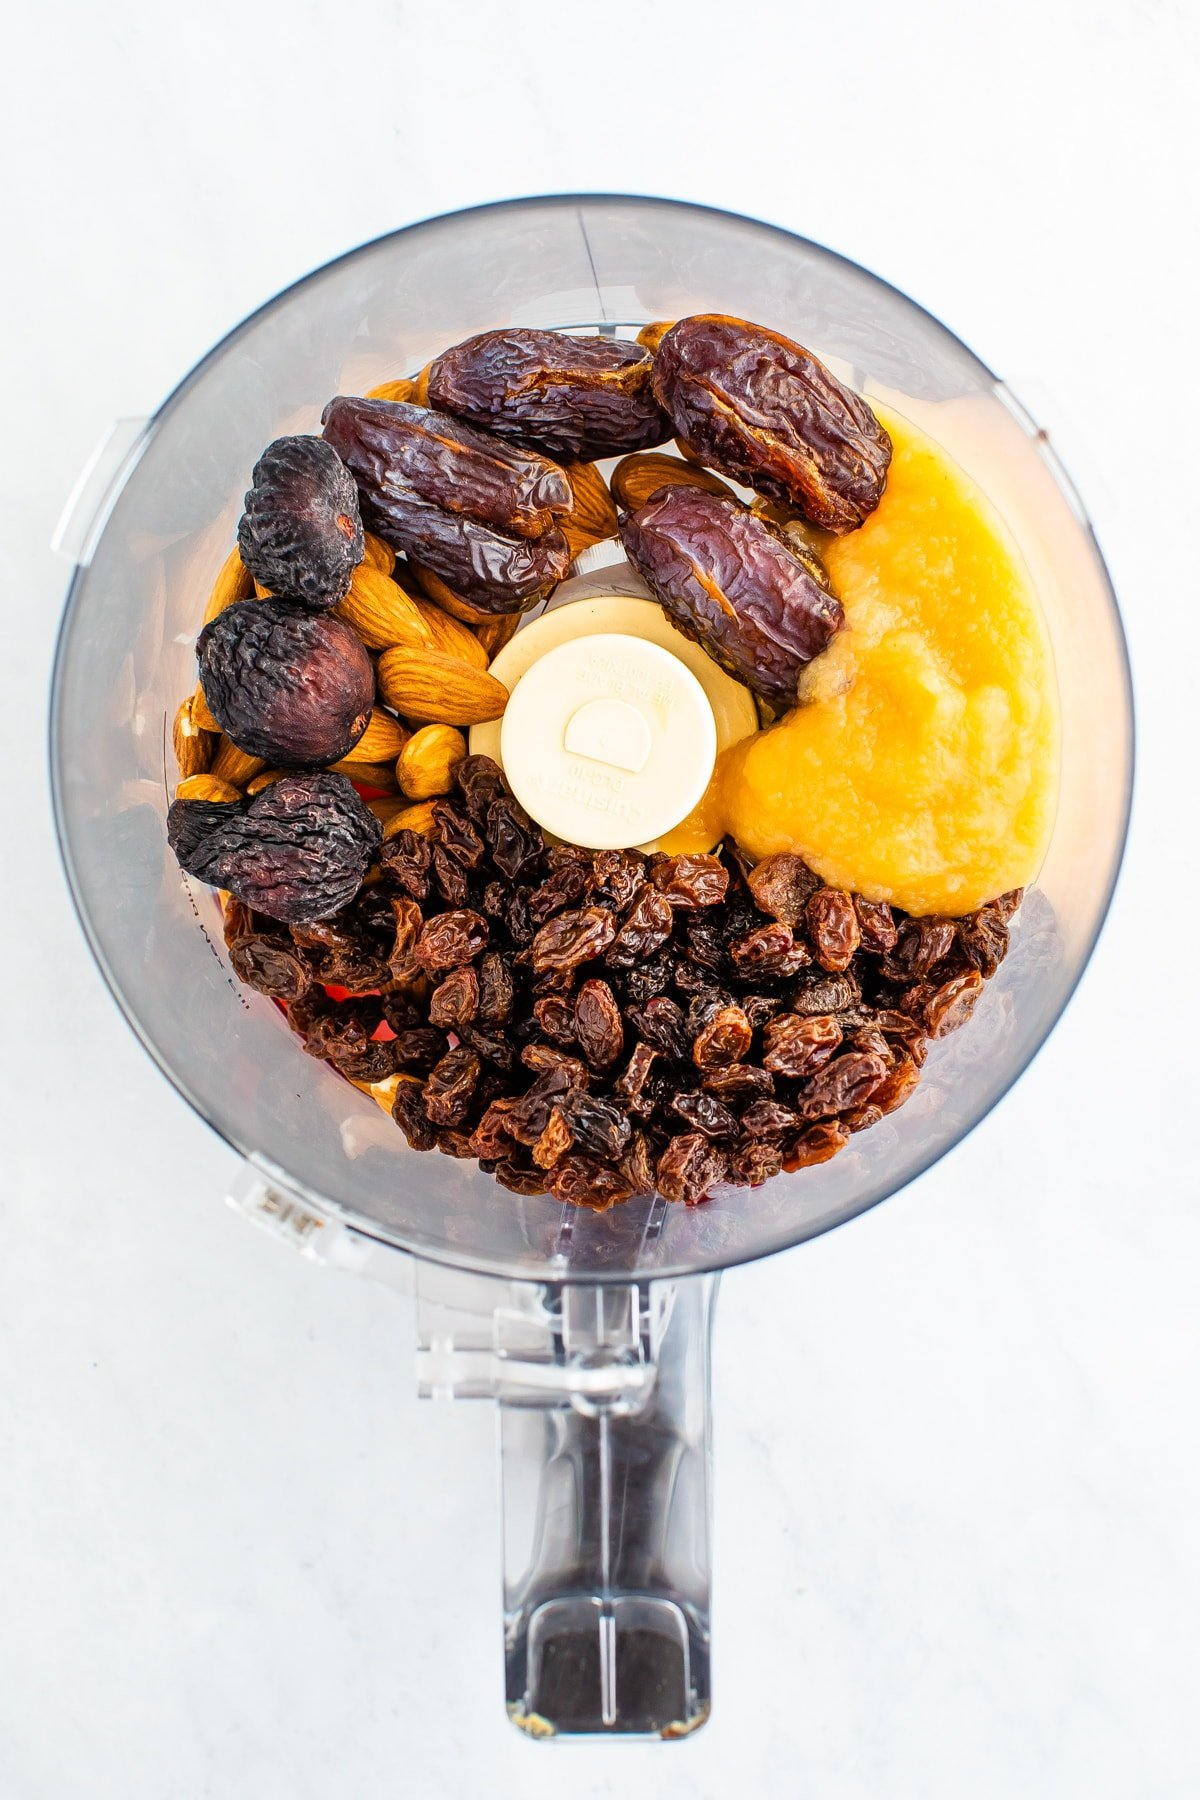 Food processor with raisin, dates, apple sauce and almonds.